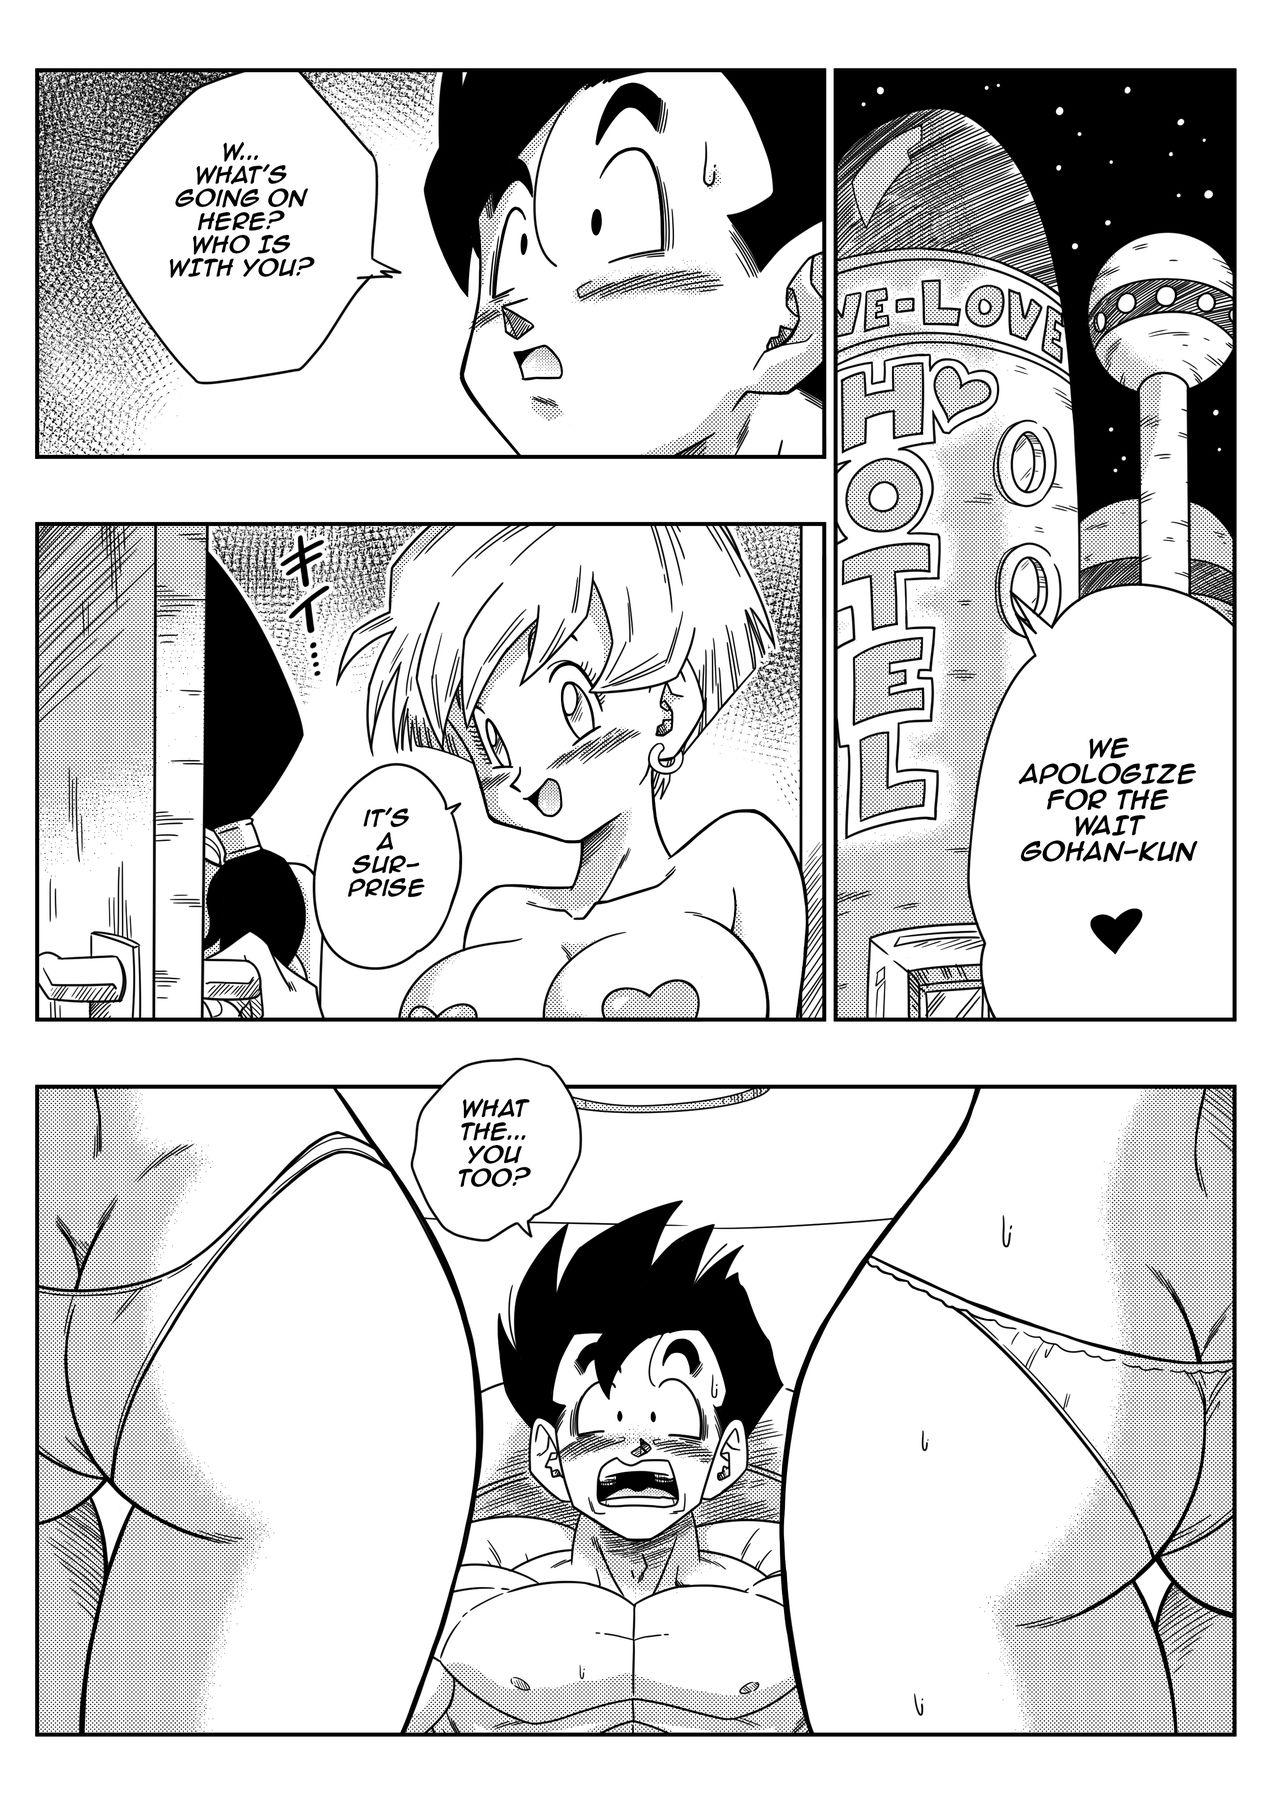 [Yamamoto] LOVE TRIANGLE Z PART 2 - Takusan Ecchi Shichaou! | LOVE TRIANGLE Z PART 2 - Let's Have Lots of Sex! (Dragon Ball Z) [English] [Decensored] 3